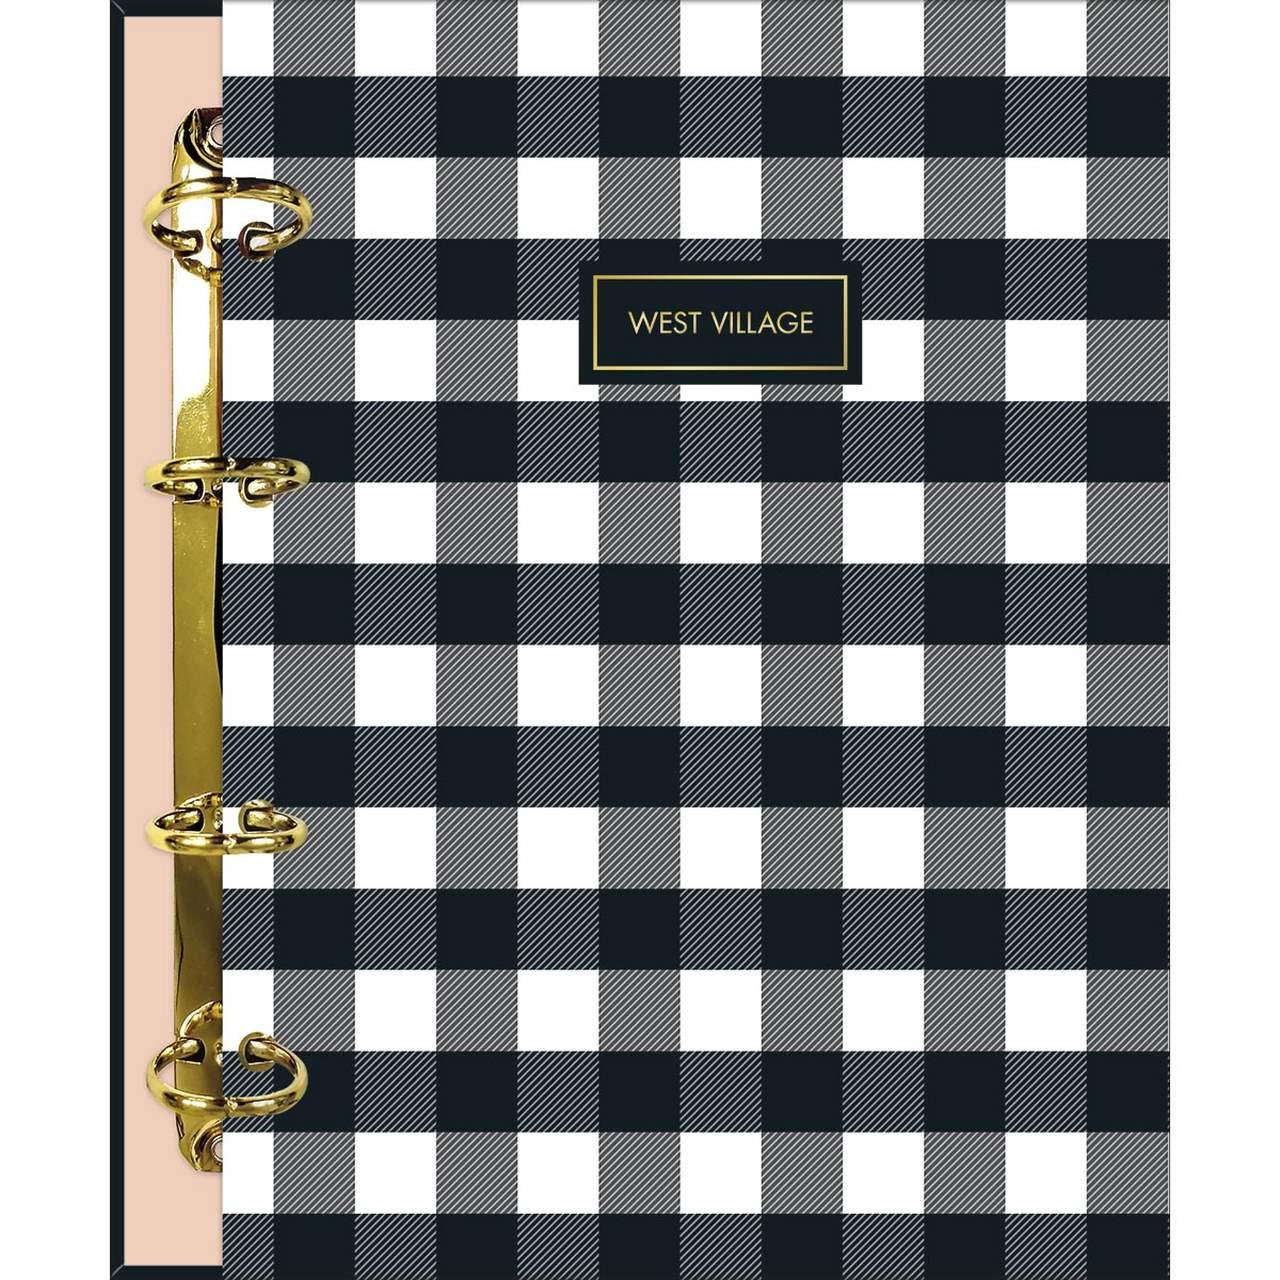 Caderno Argolado quadriculado Colegial West Village 160 Folhas